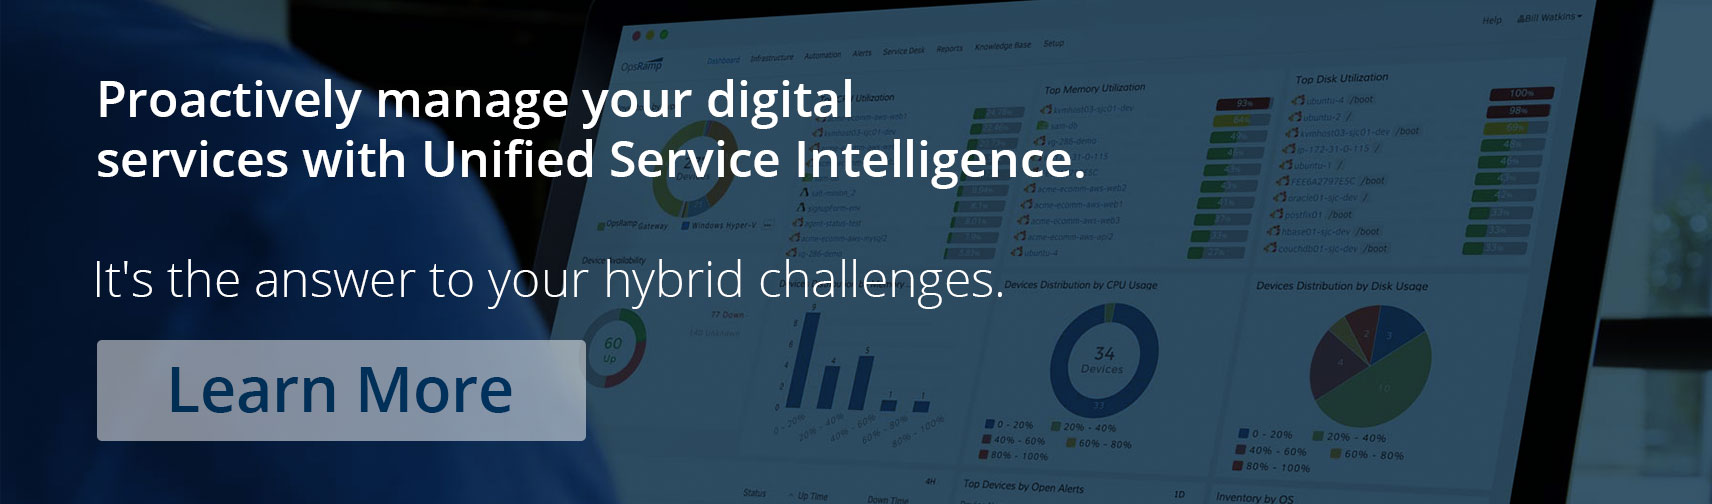 Unified Service Intelligence